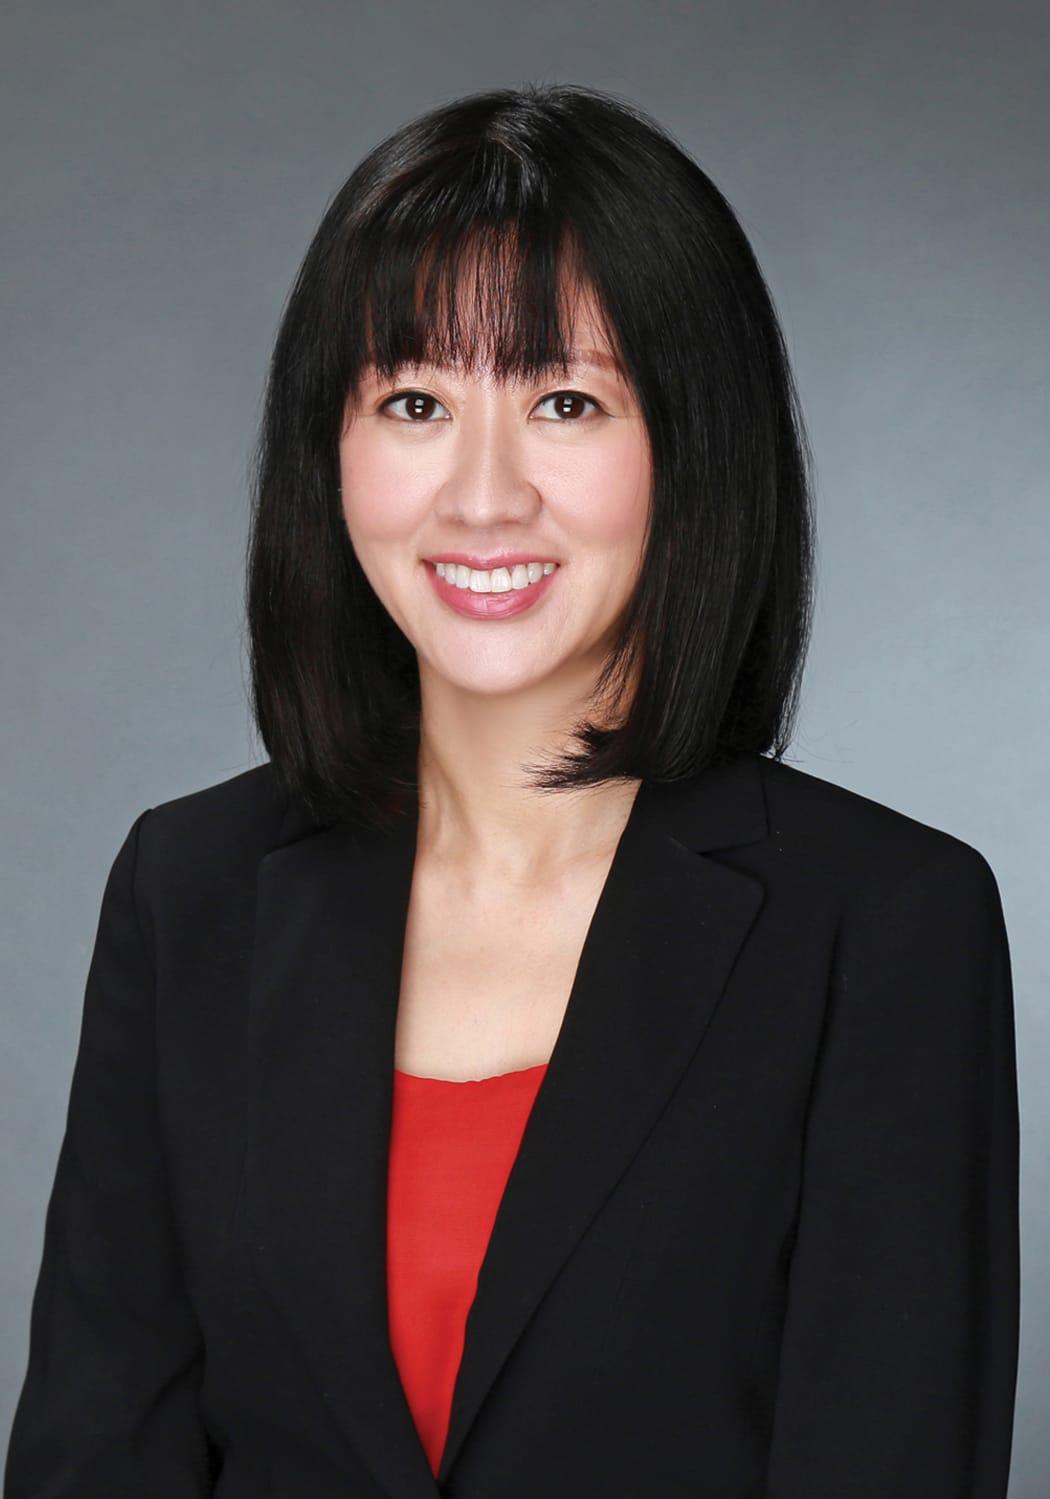 Catherine Lim